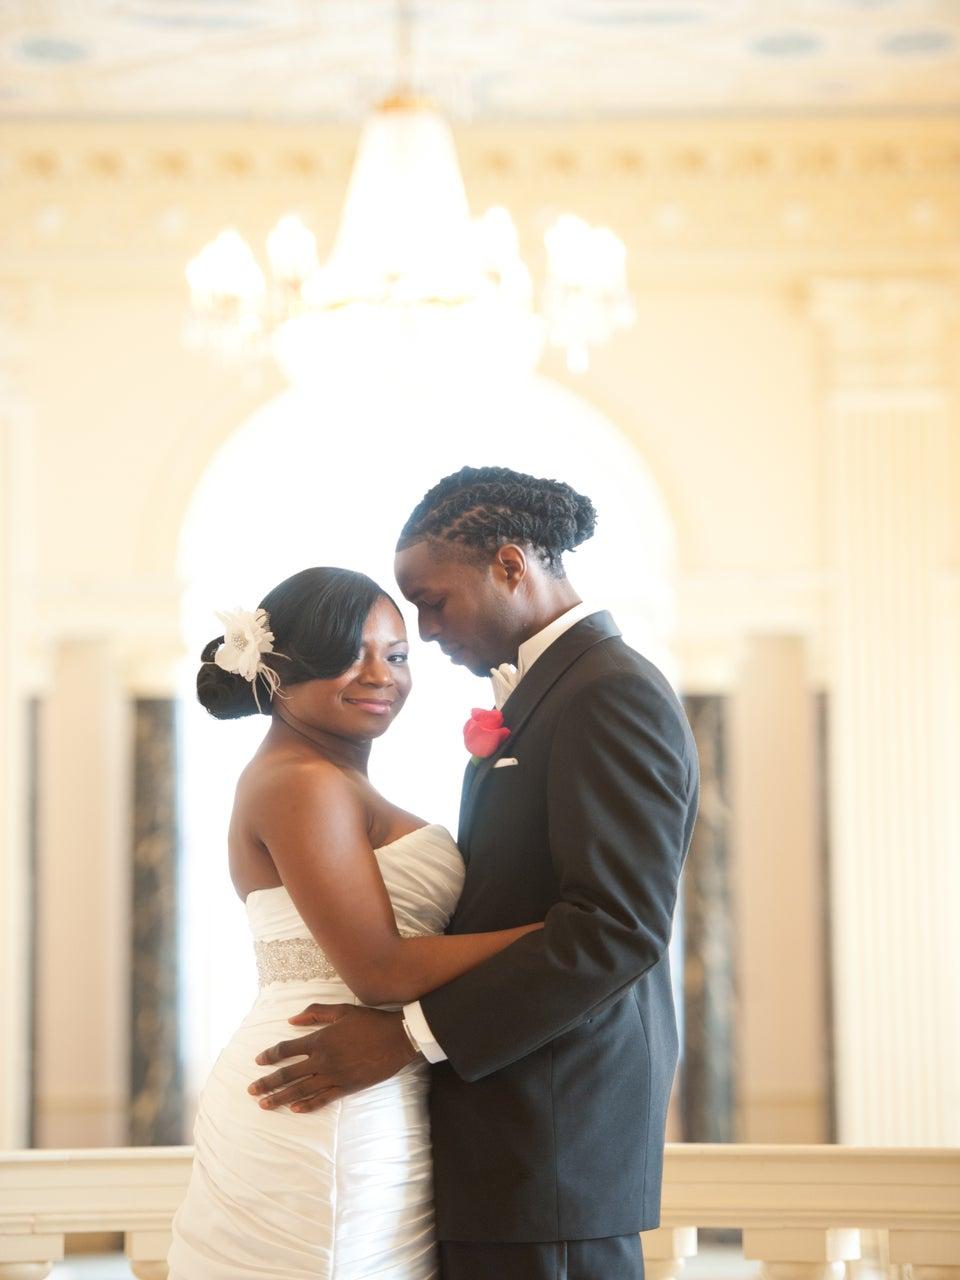 Bridal Bliss: My Love Runs Deep